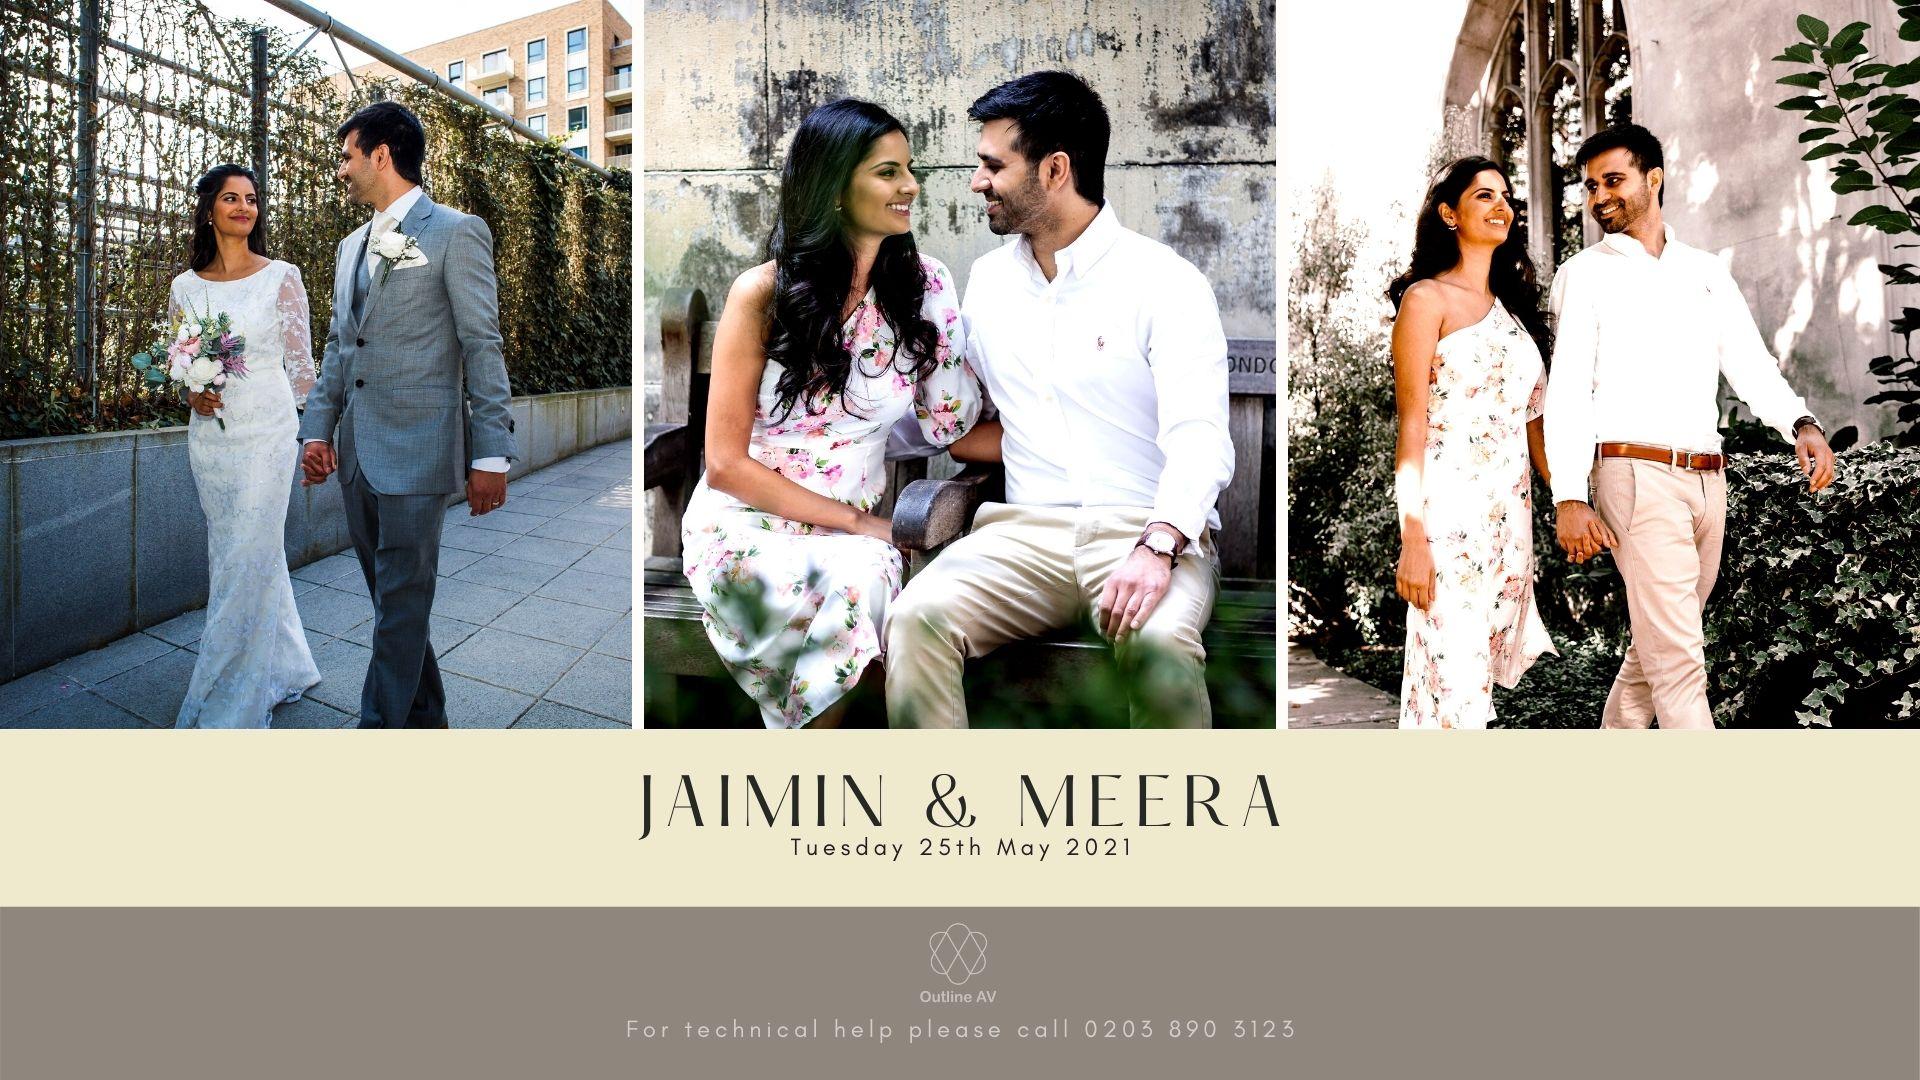 Jaimin & Meera - Live Stream